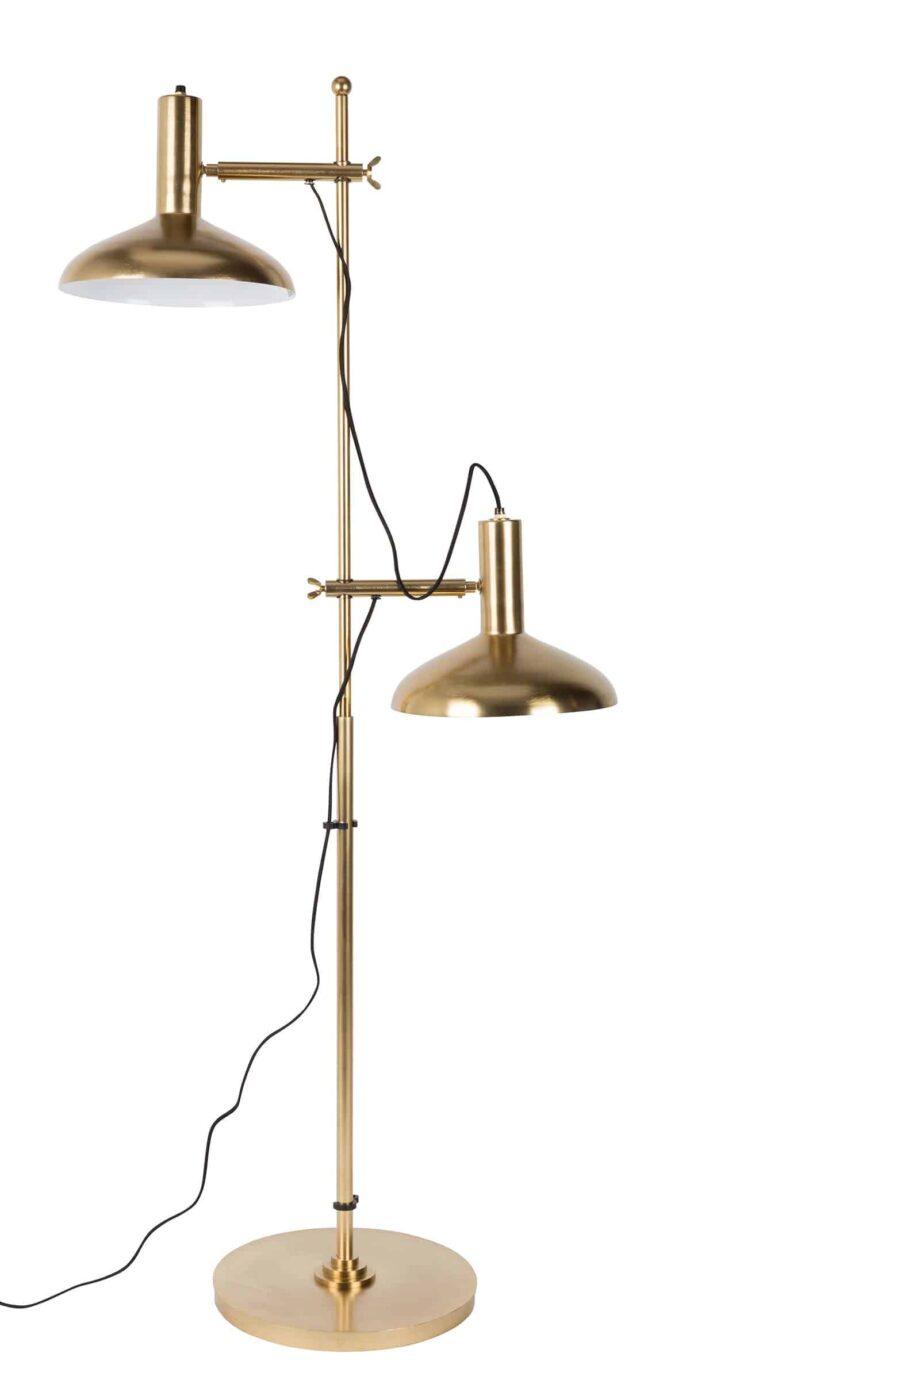 Karish vloerlampen Dutchbone